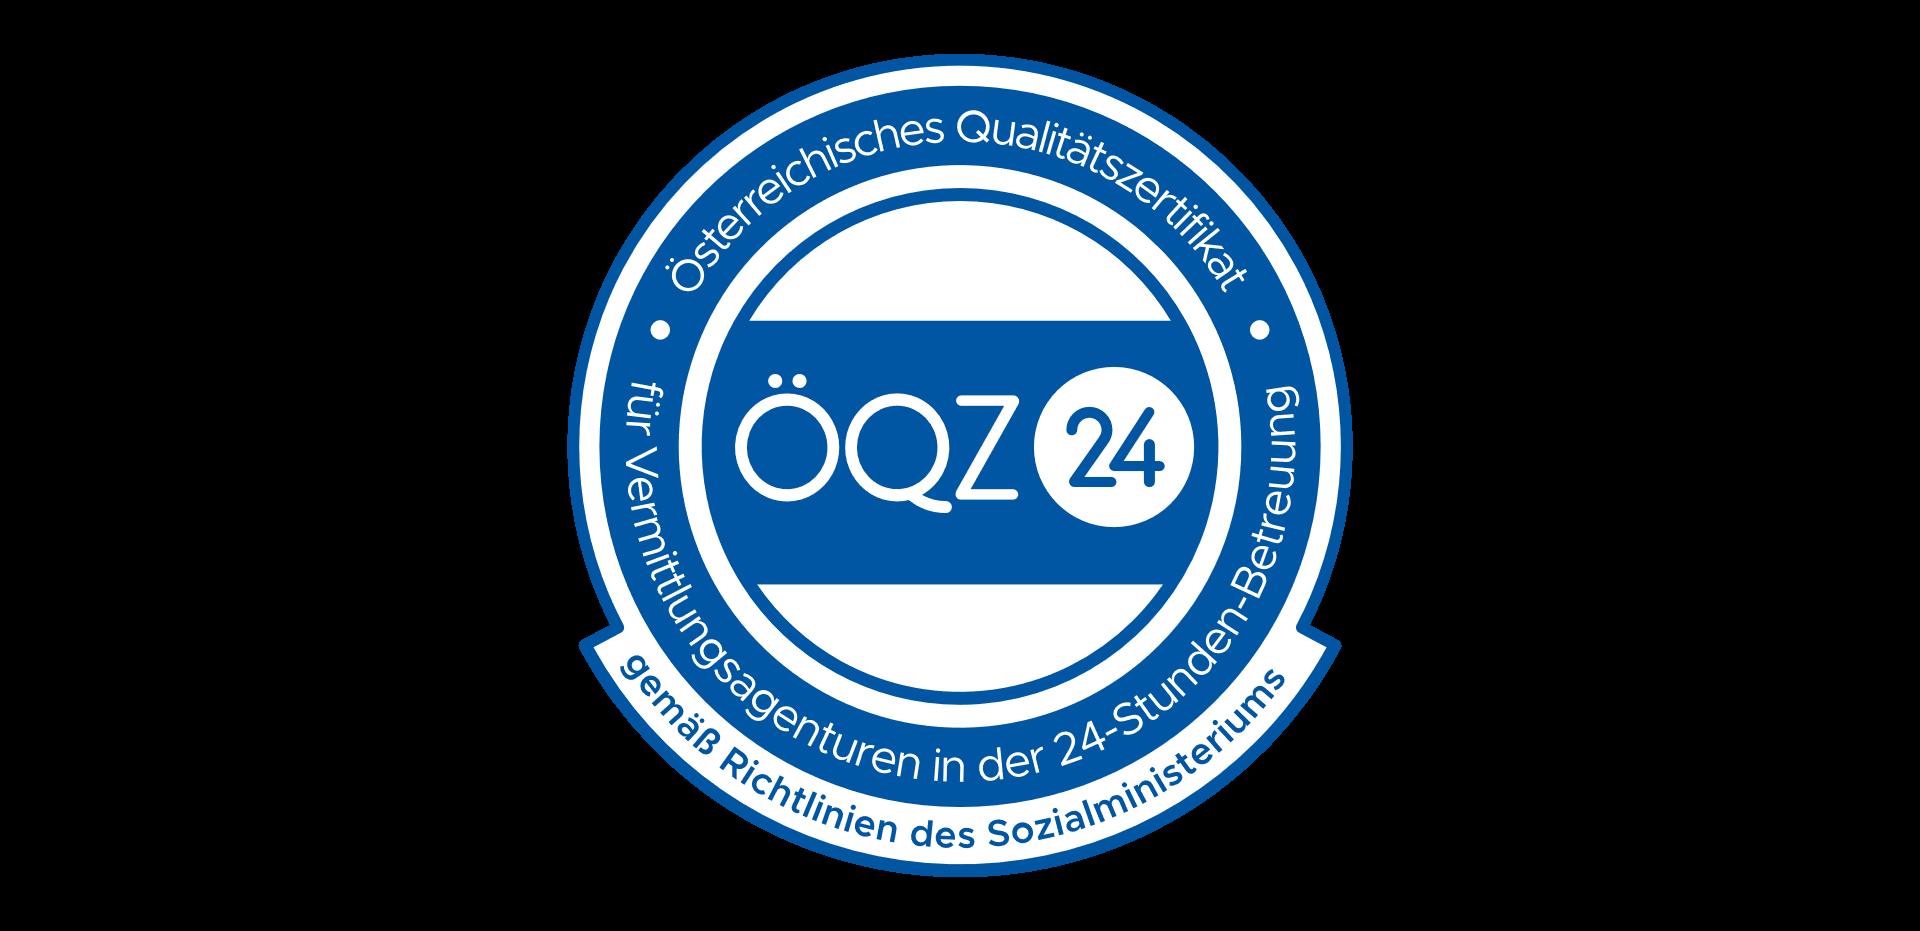 ÖQZ_Siegel_Final